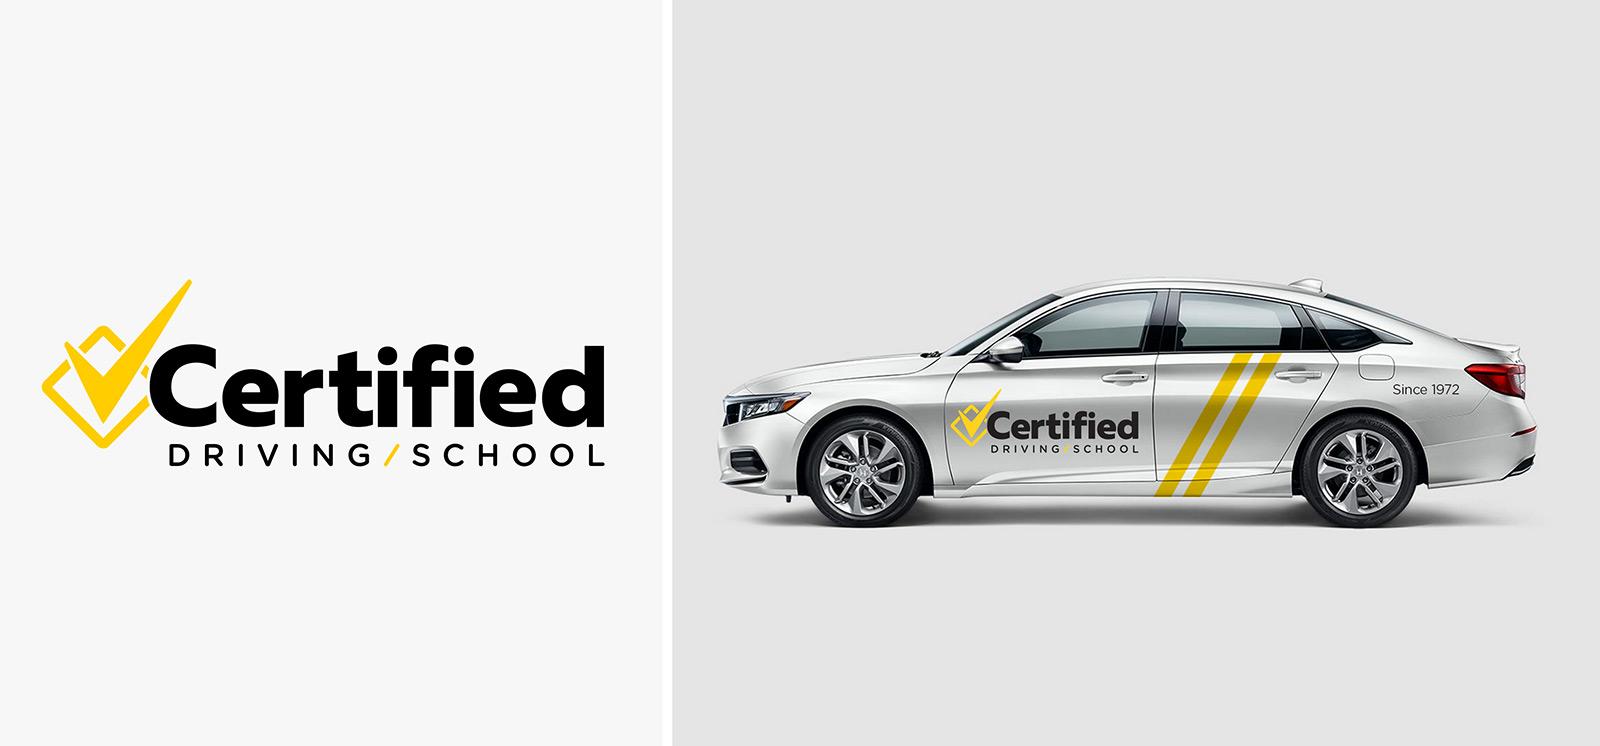 Certified Driving School logo design / vehicle graphics design